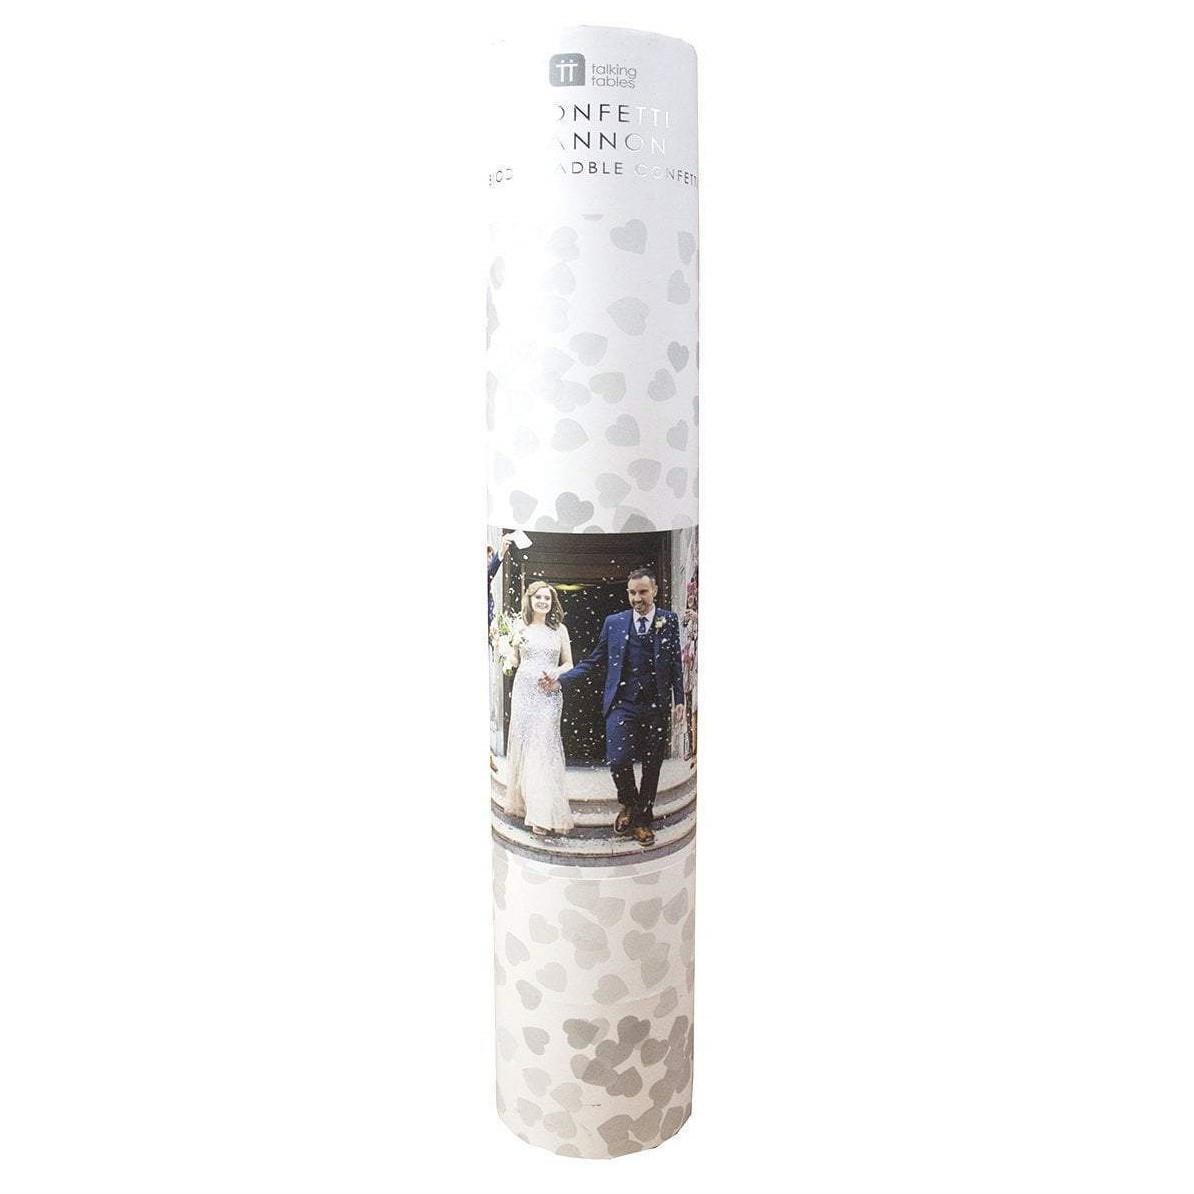 Talking Tables Dělo na konfety Confetti Cannon, bílá barva, papír